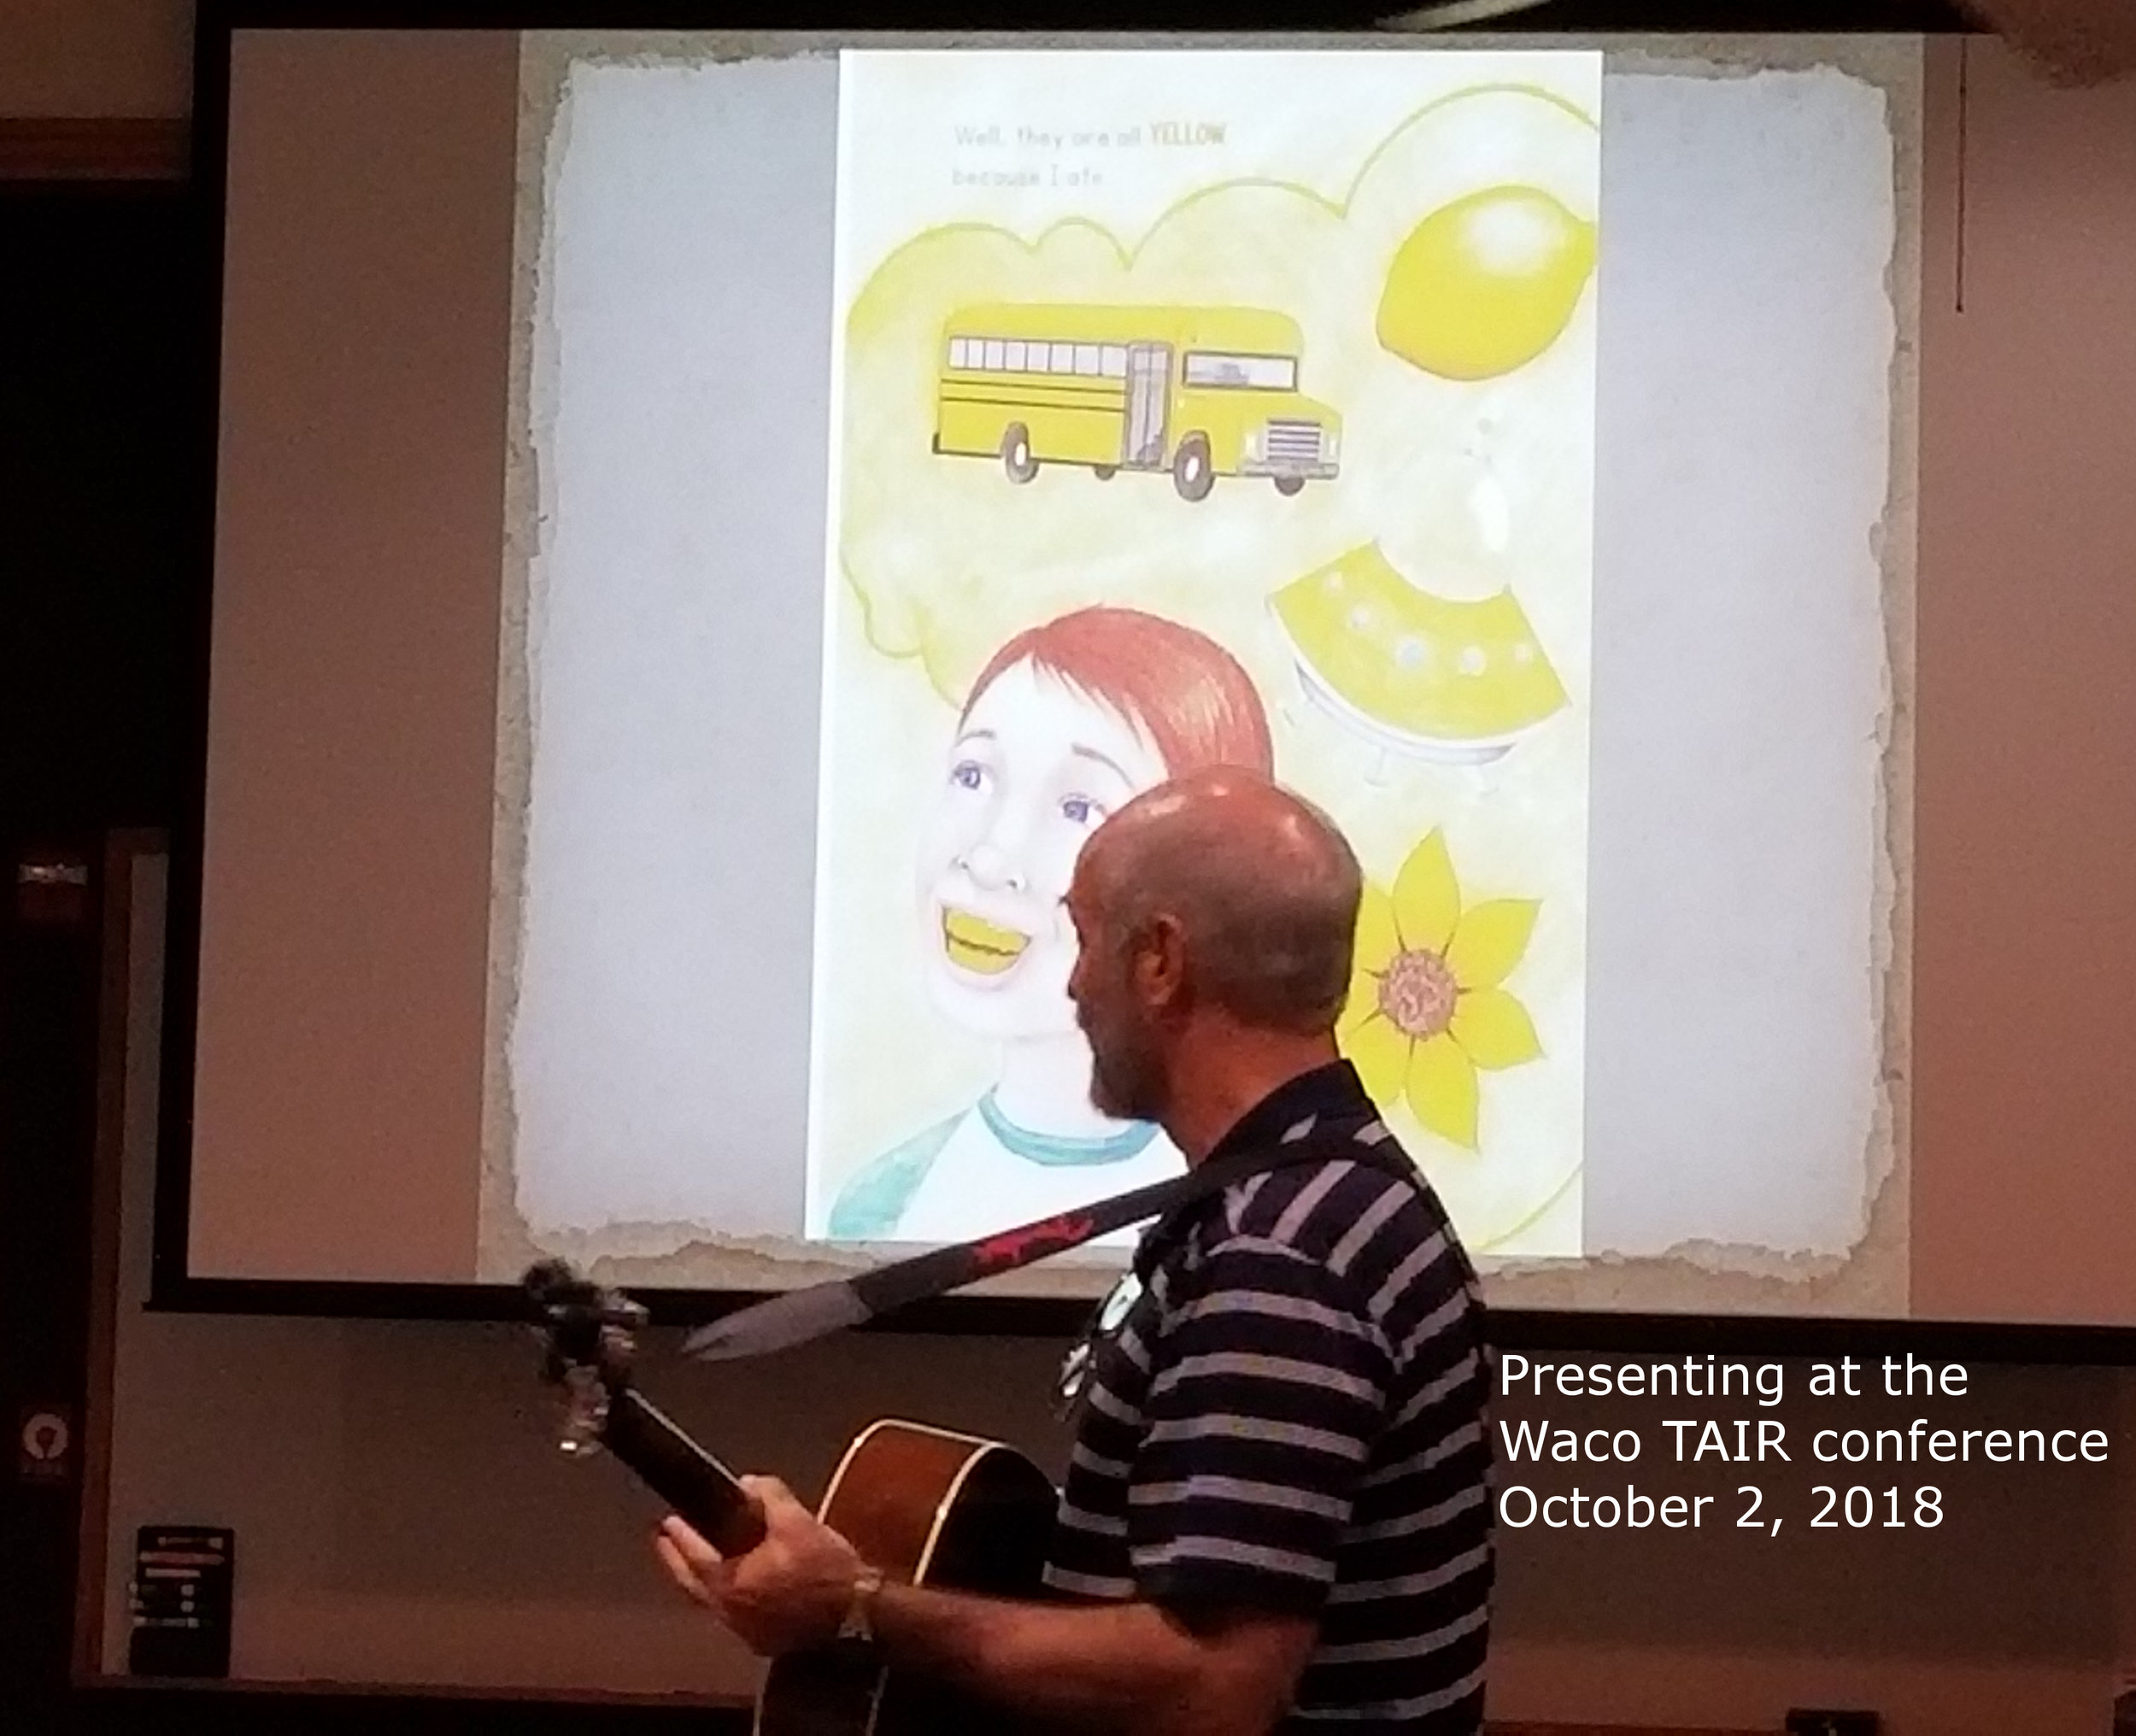 Waco TAIR presenting.jpg